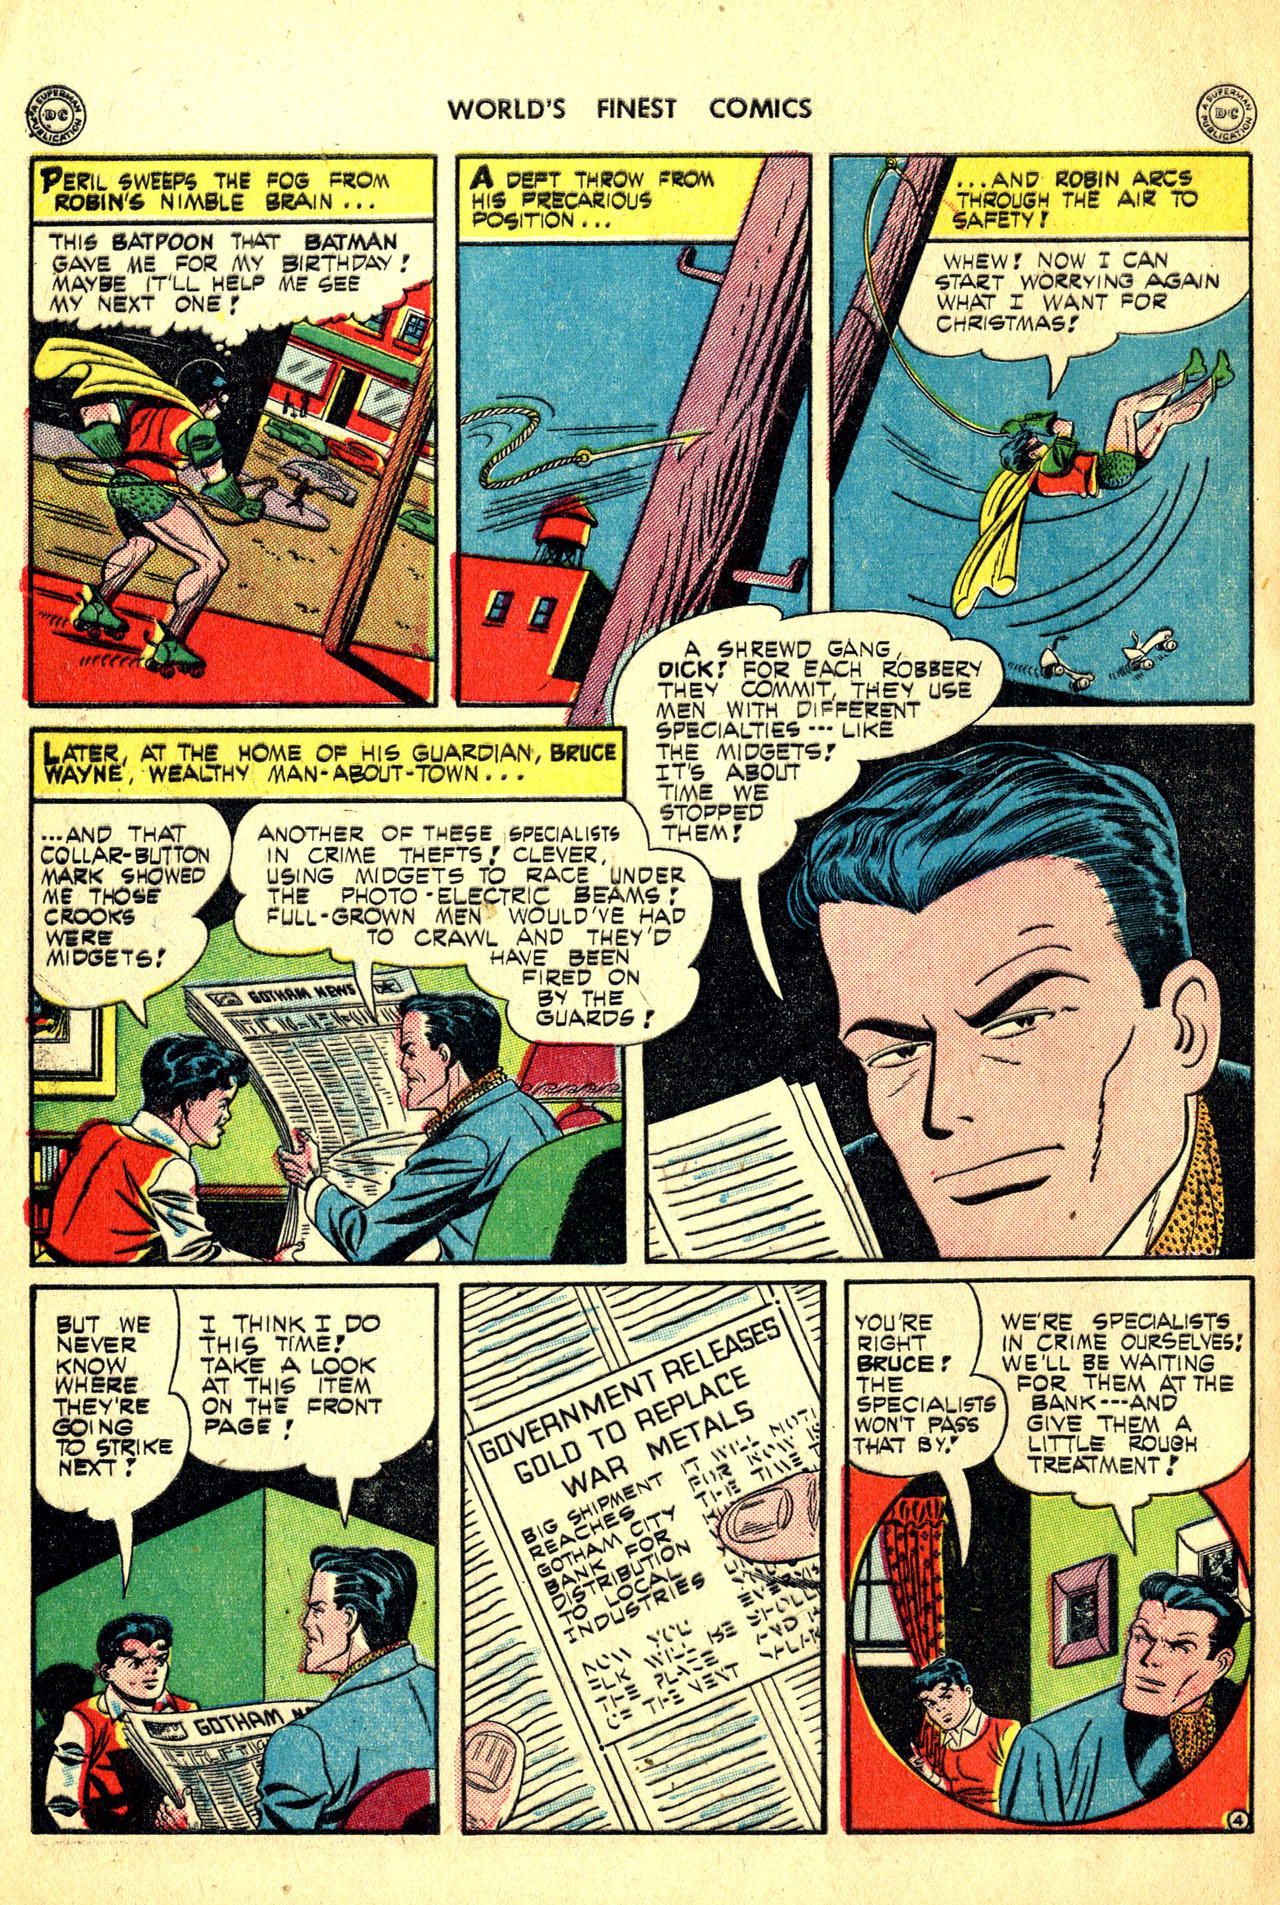 Read online World's Finest Comics comic -  Issue #18 - 72